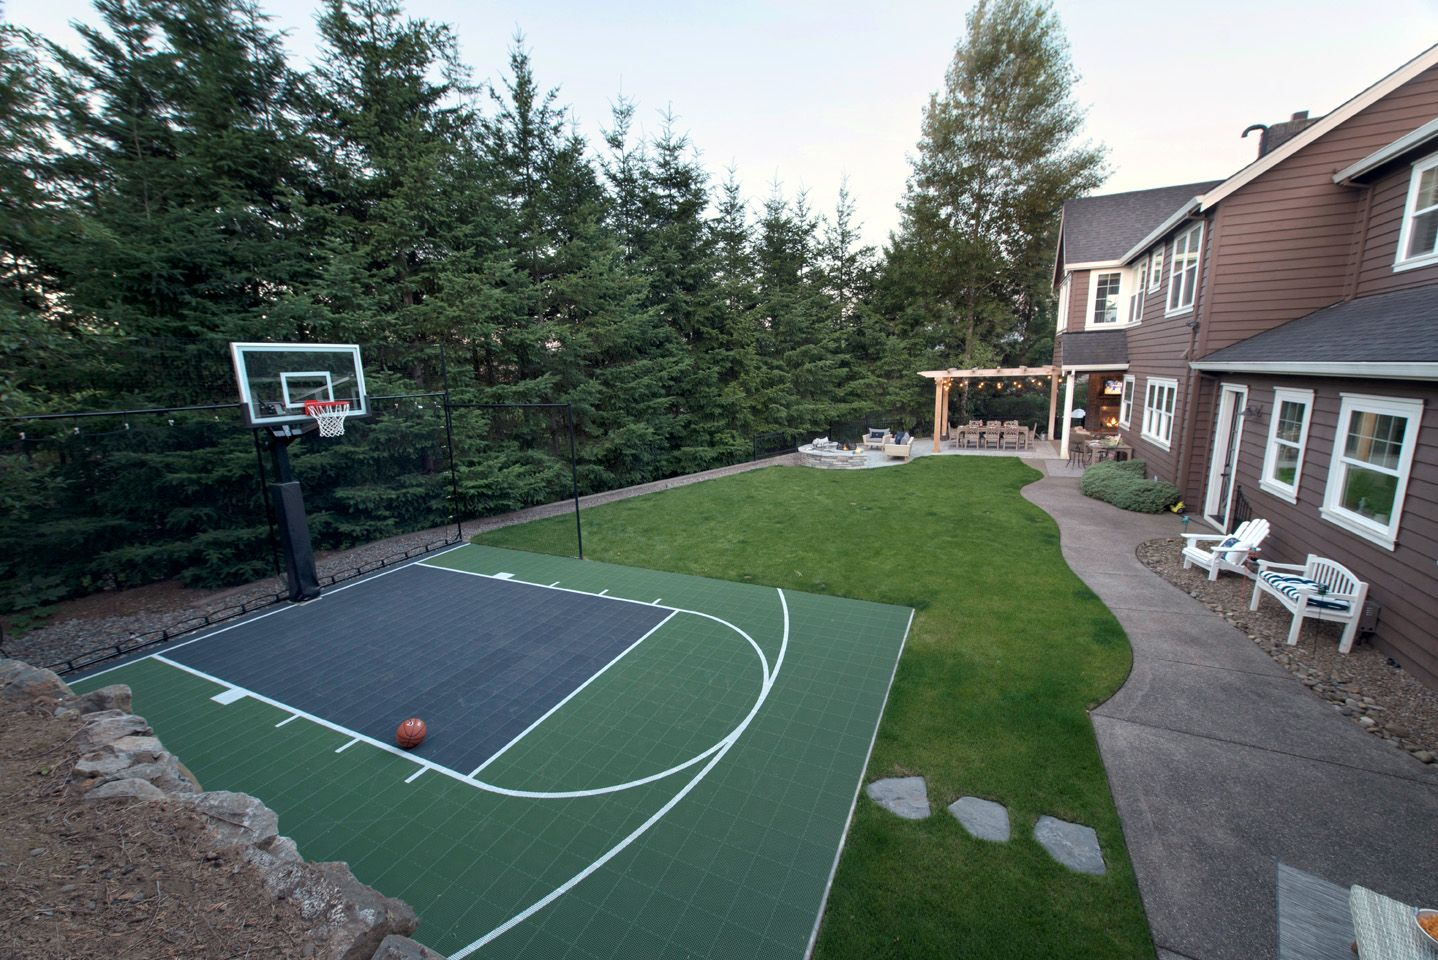 Backyard Basketball Court Paradise Restored Landscaping Basketball Court Backyard Backyard Basketball Backyard Court Backyard landscaping ideas with basketball court